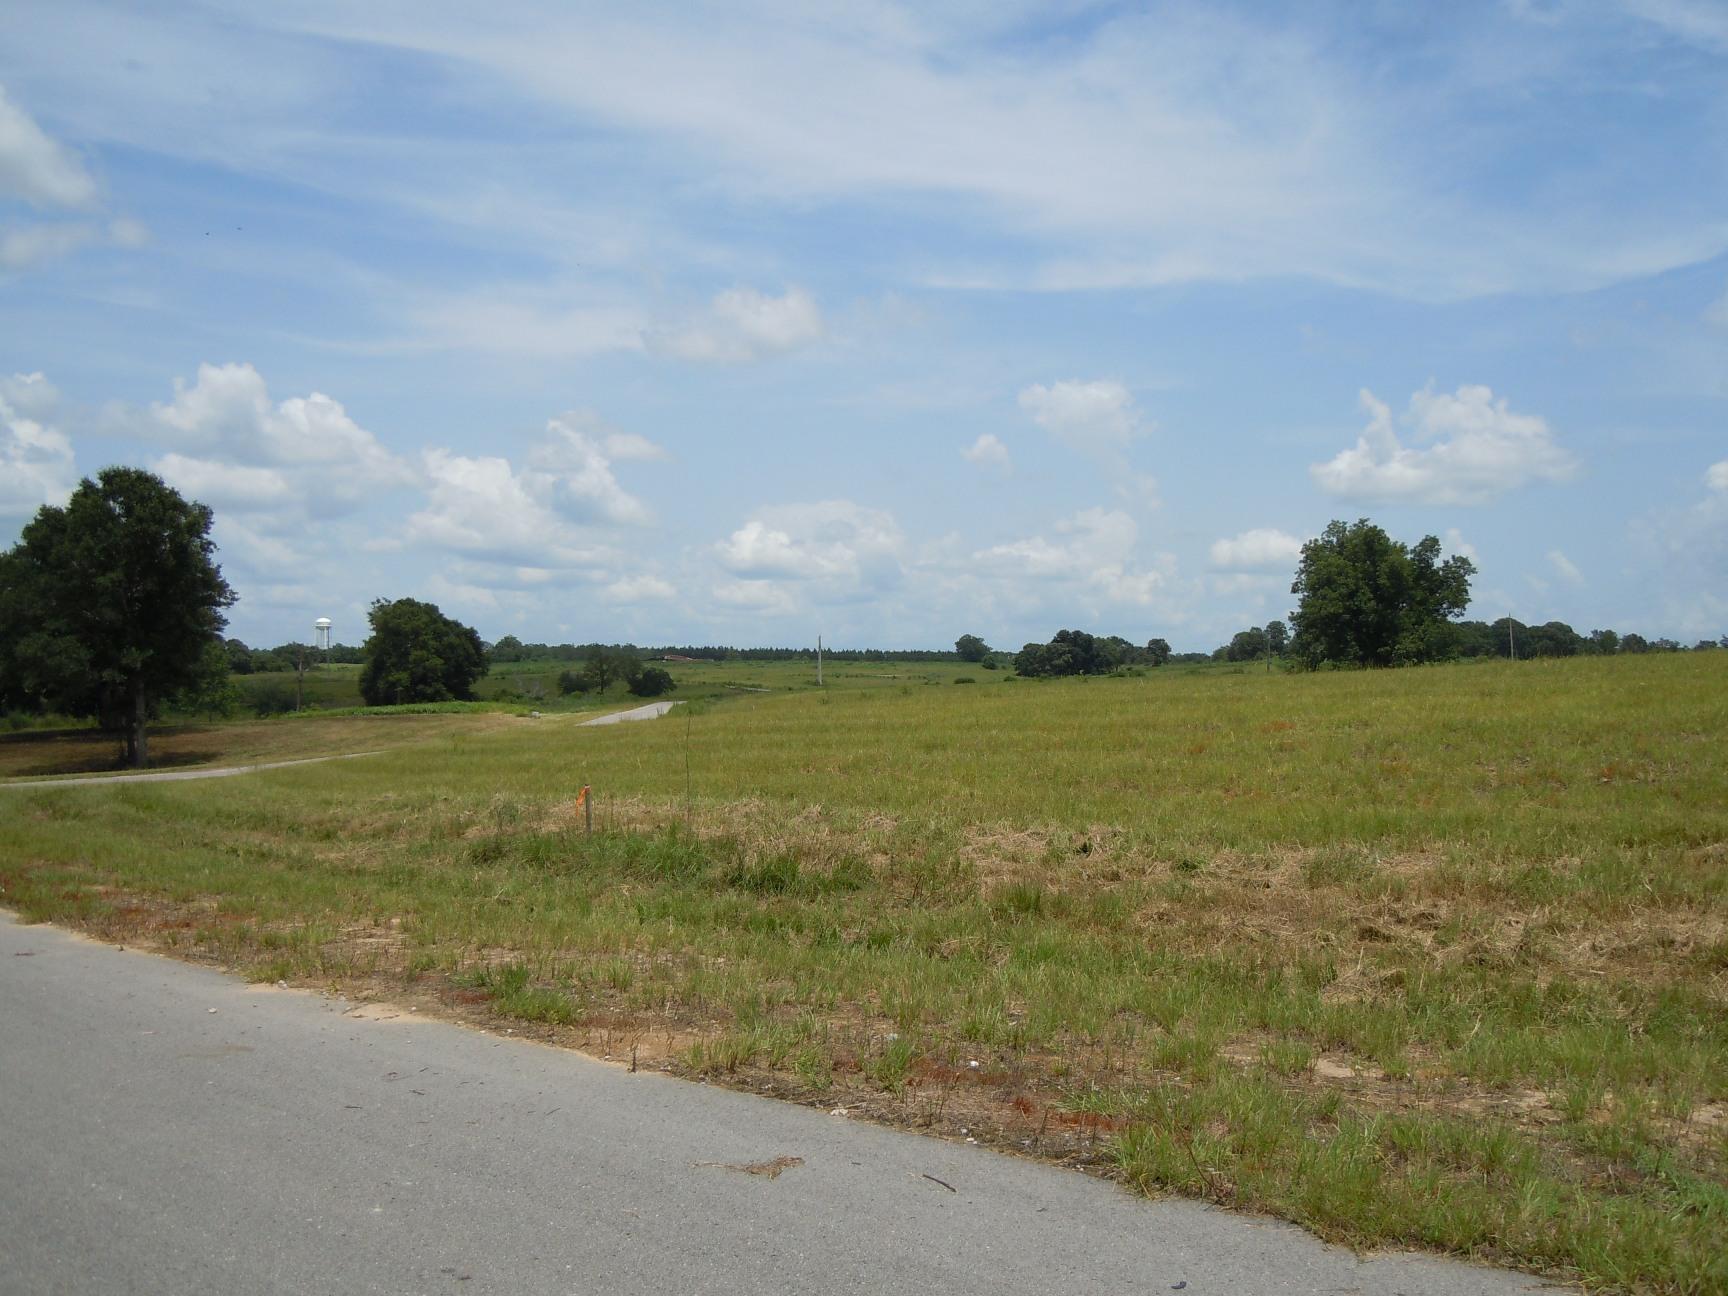 Lot 36 Susan Cooley Rd, Lucedale, Mississippi 39452